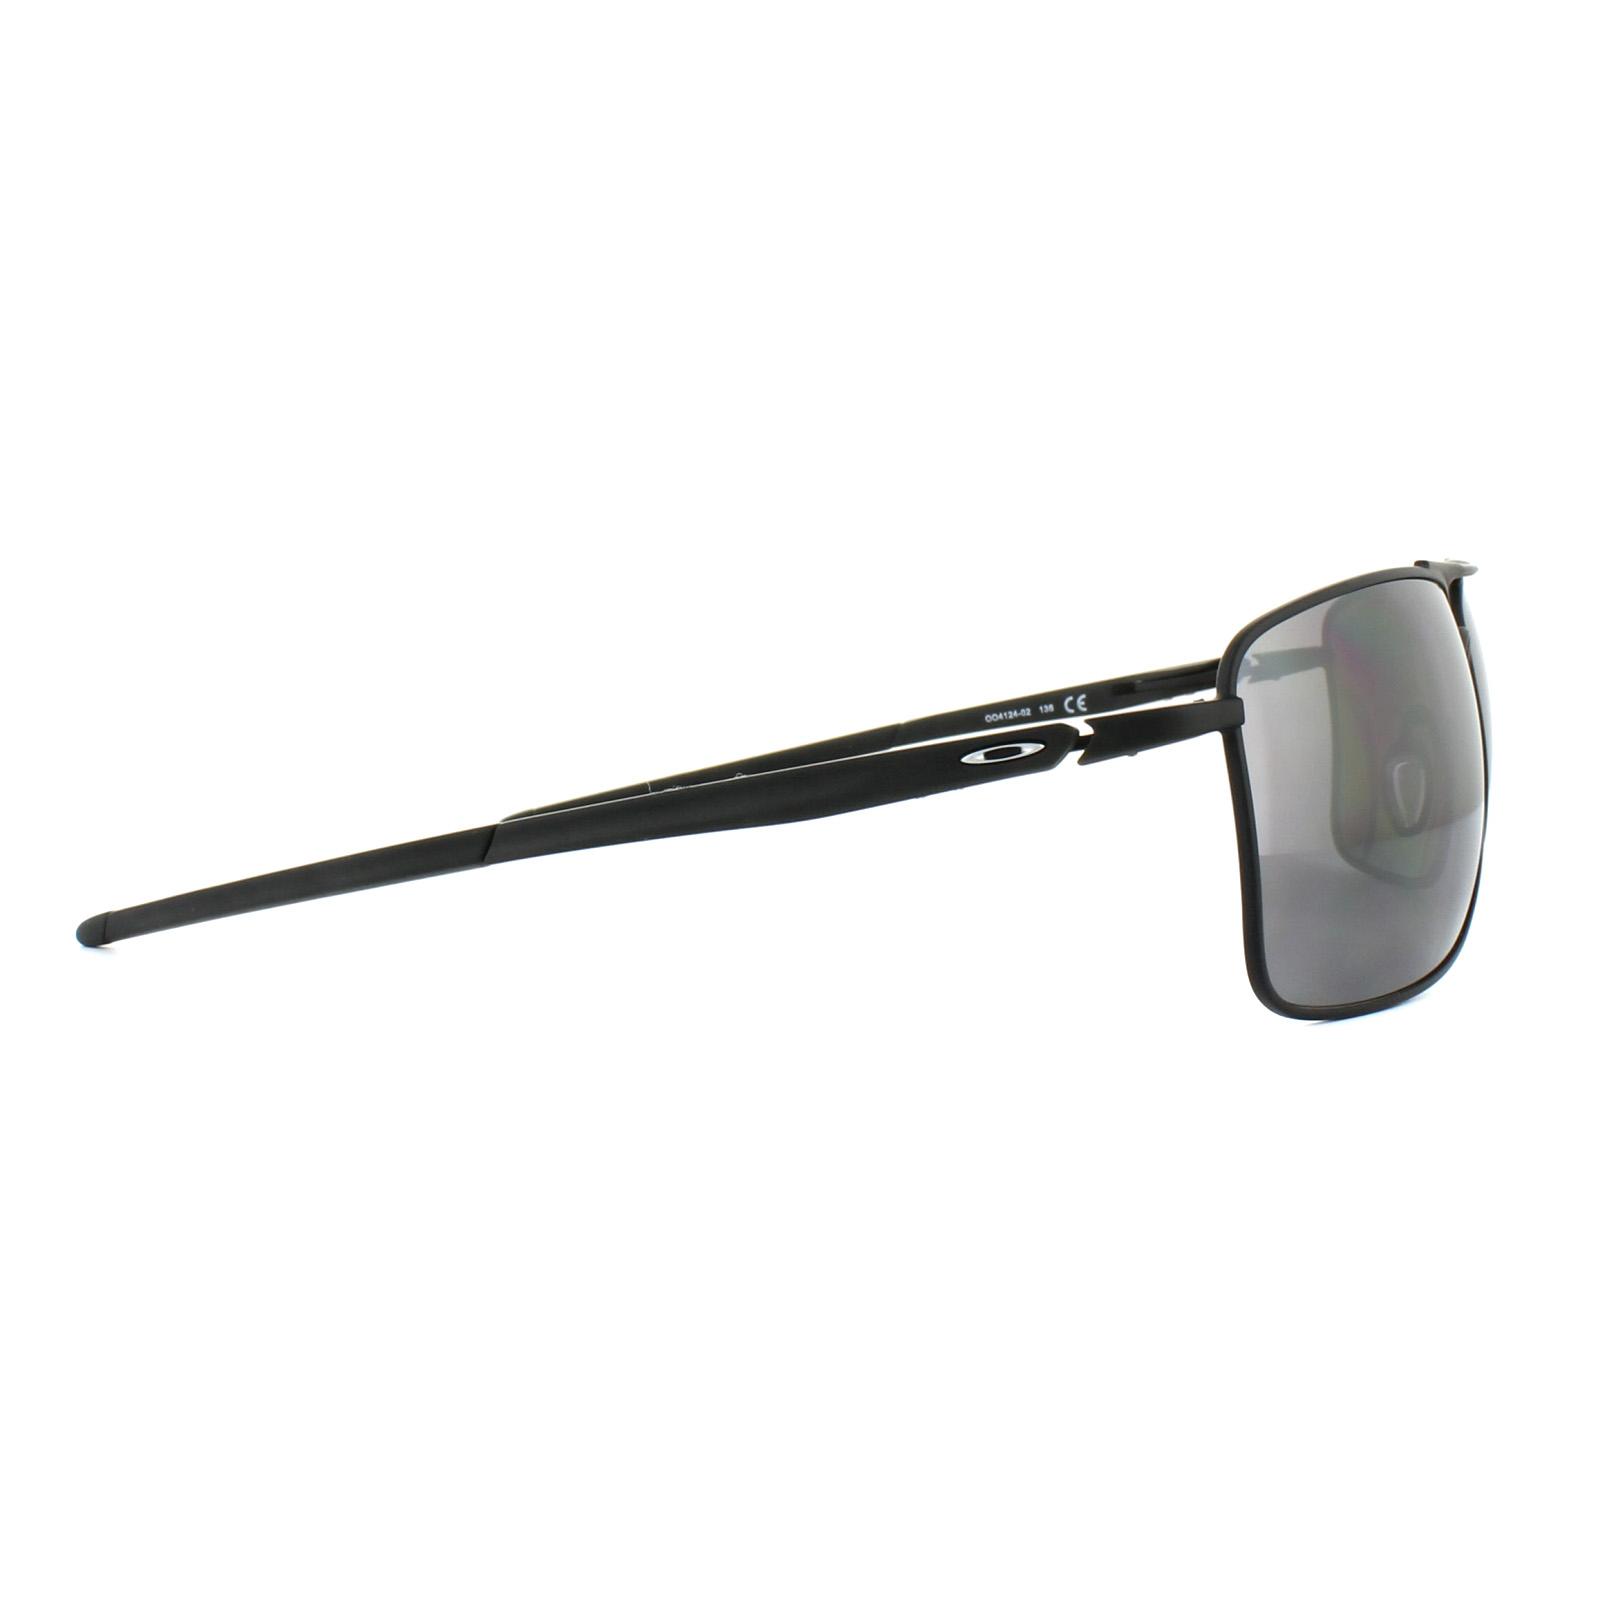 a7637ba3d7 Sentinel Oakley Sunglasses Gauge 8 L OO4124-02 Matt Black Prizm Black  Polarized